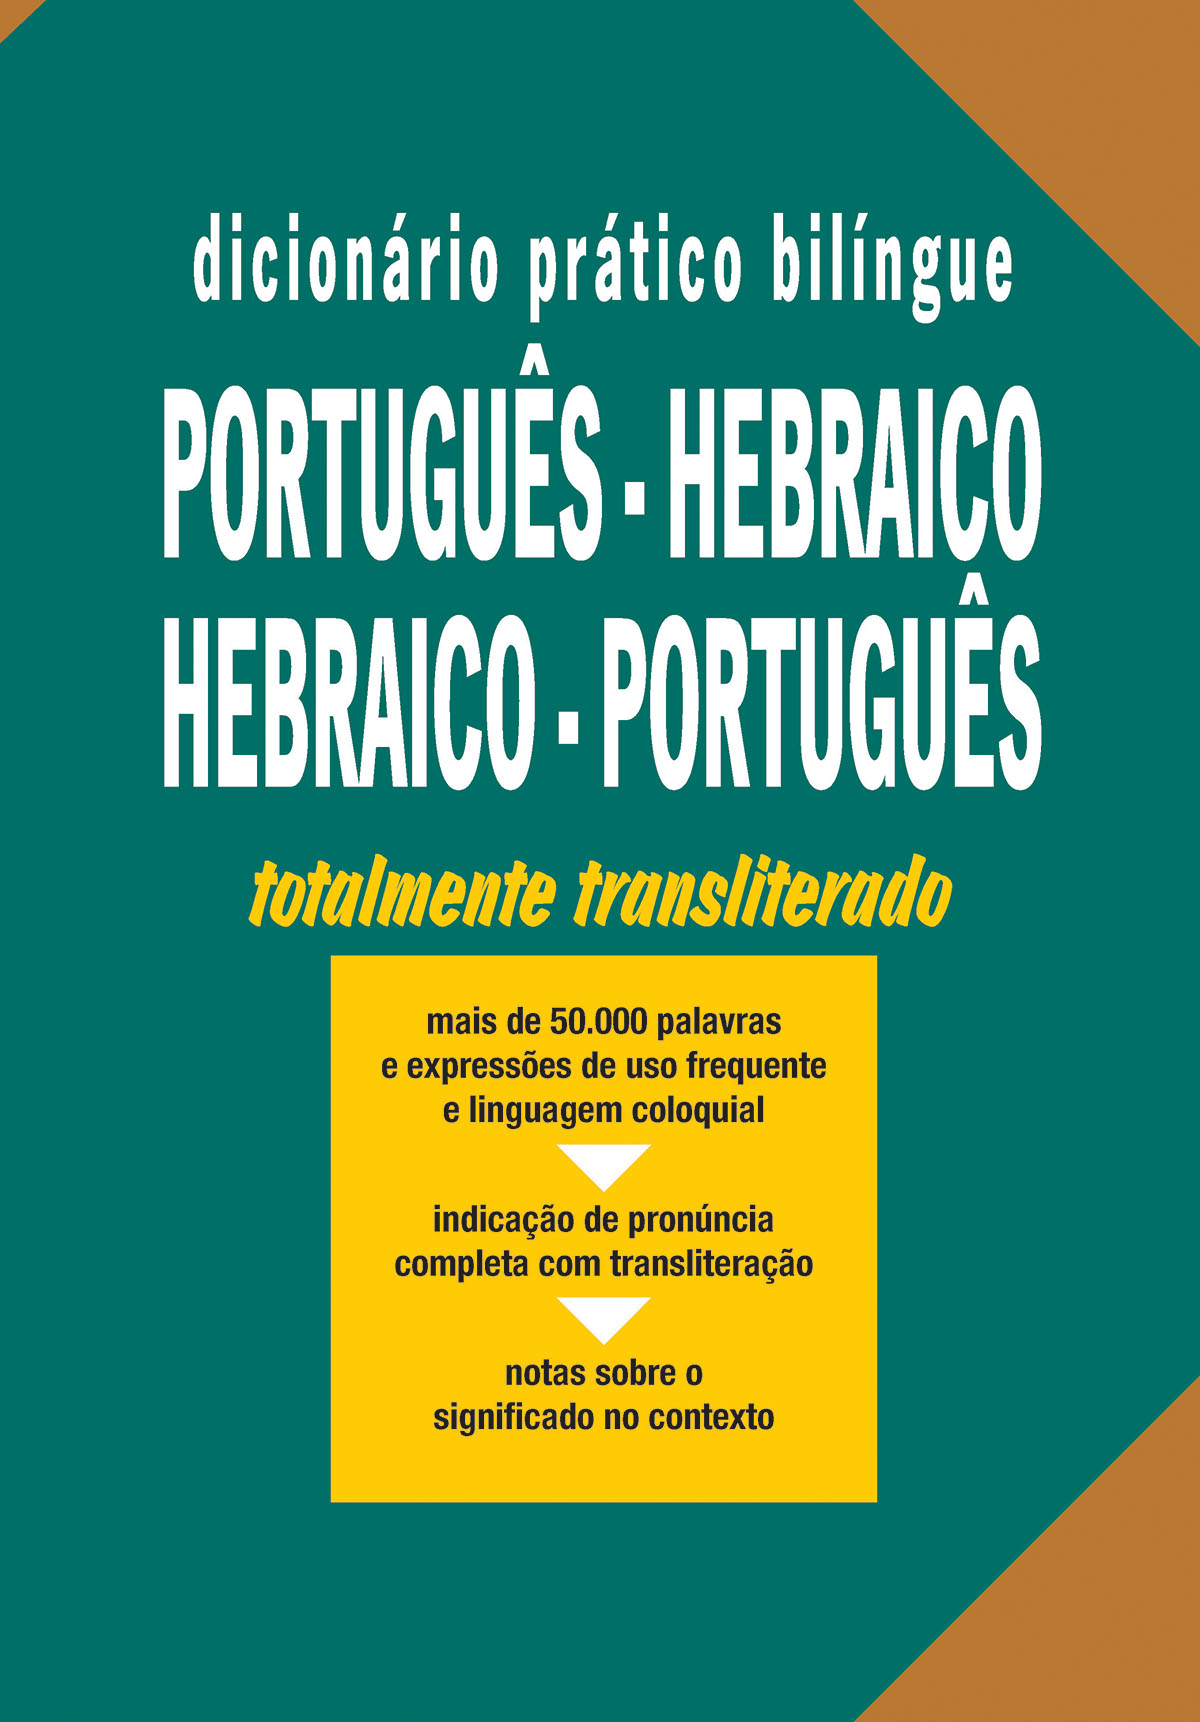 Tradutor Hebraico Português